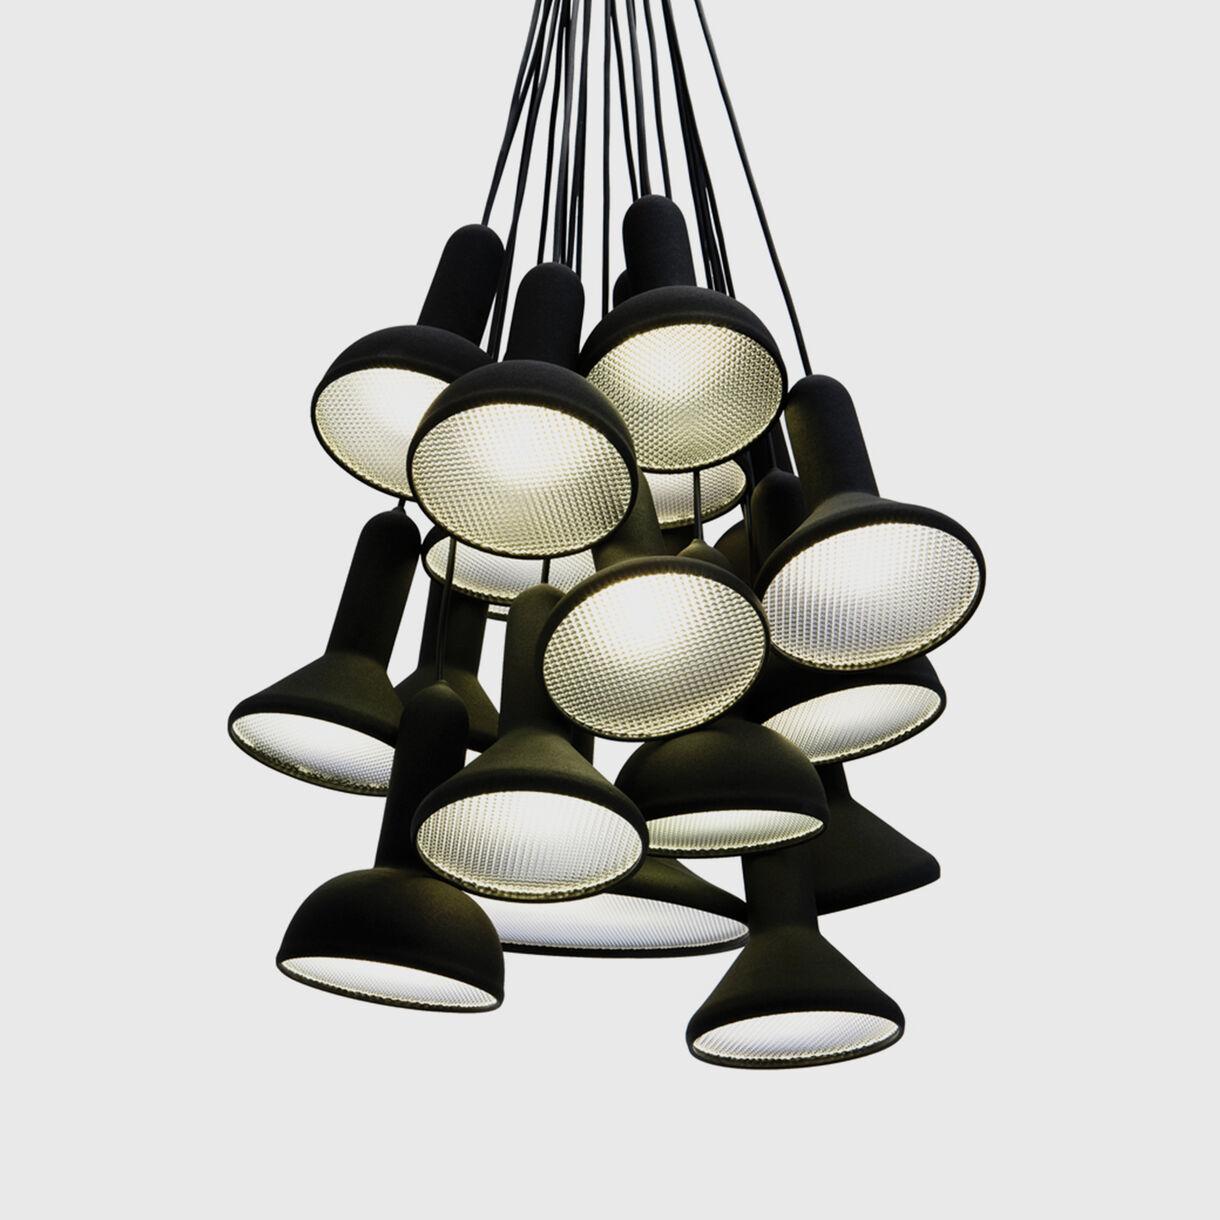 Torch Light, S20, Black